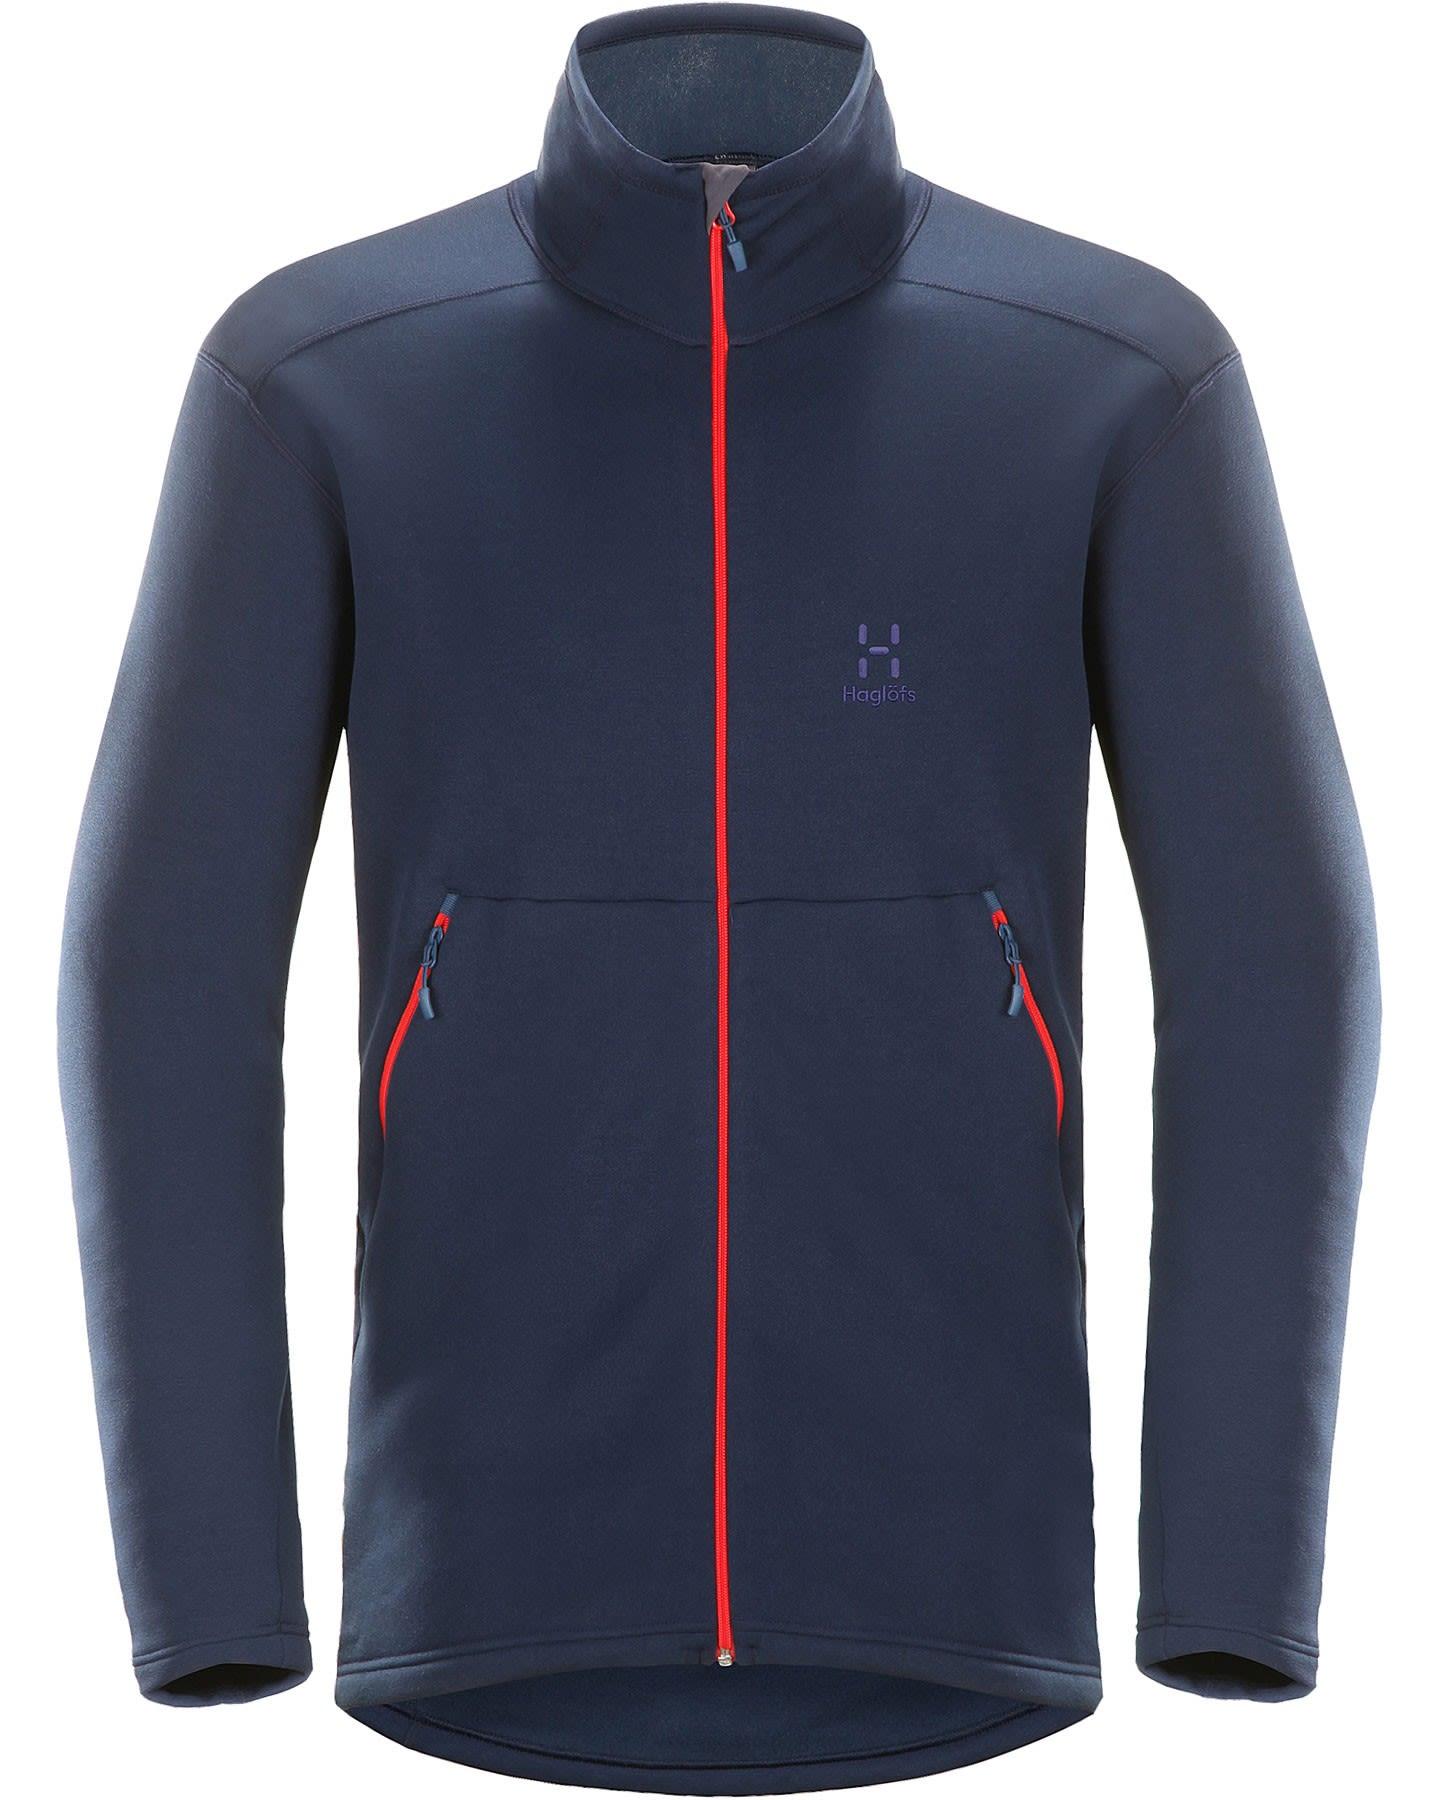 Haglöfs M Bungy Jacket (Modell Sommer 2018) | Herren Langarm-Shirt